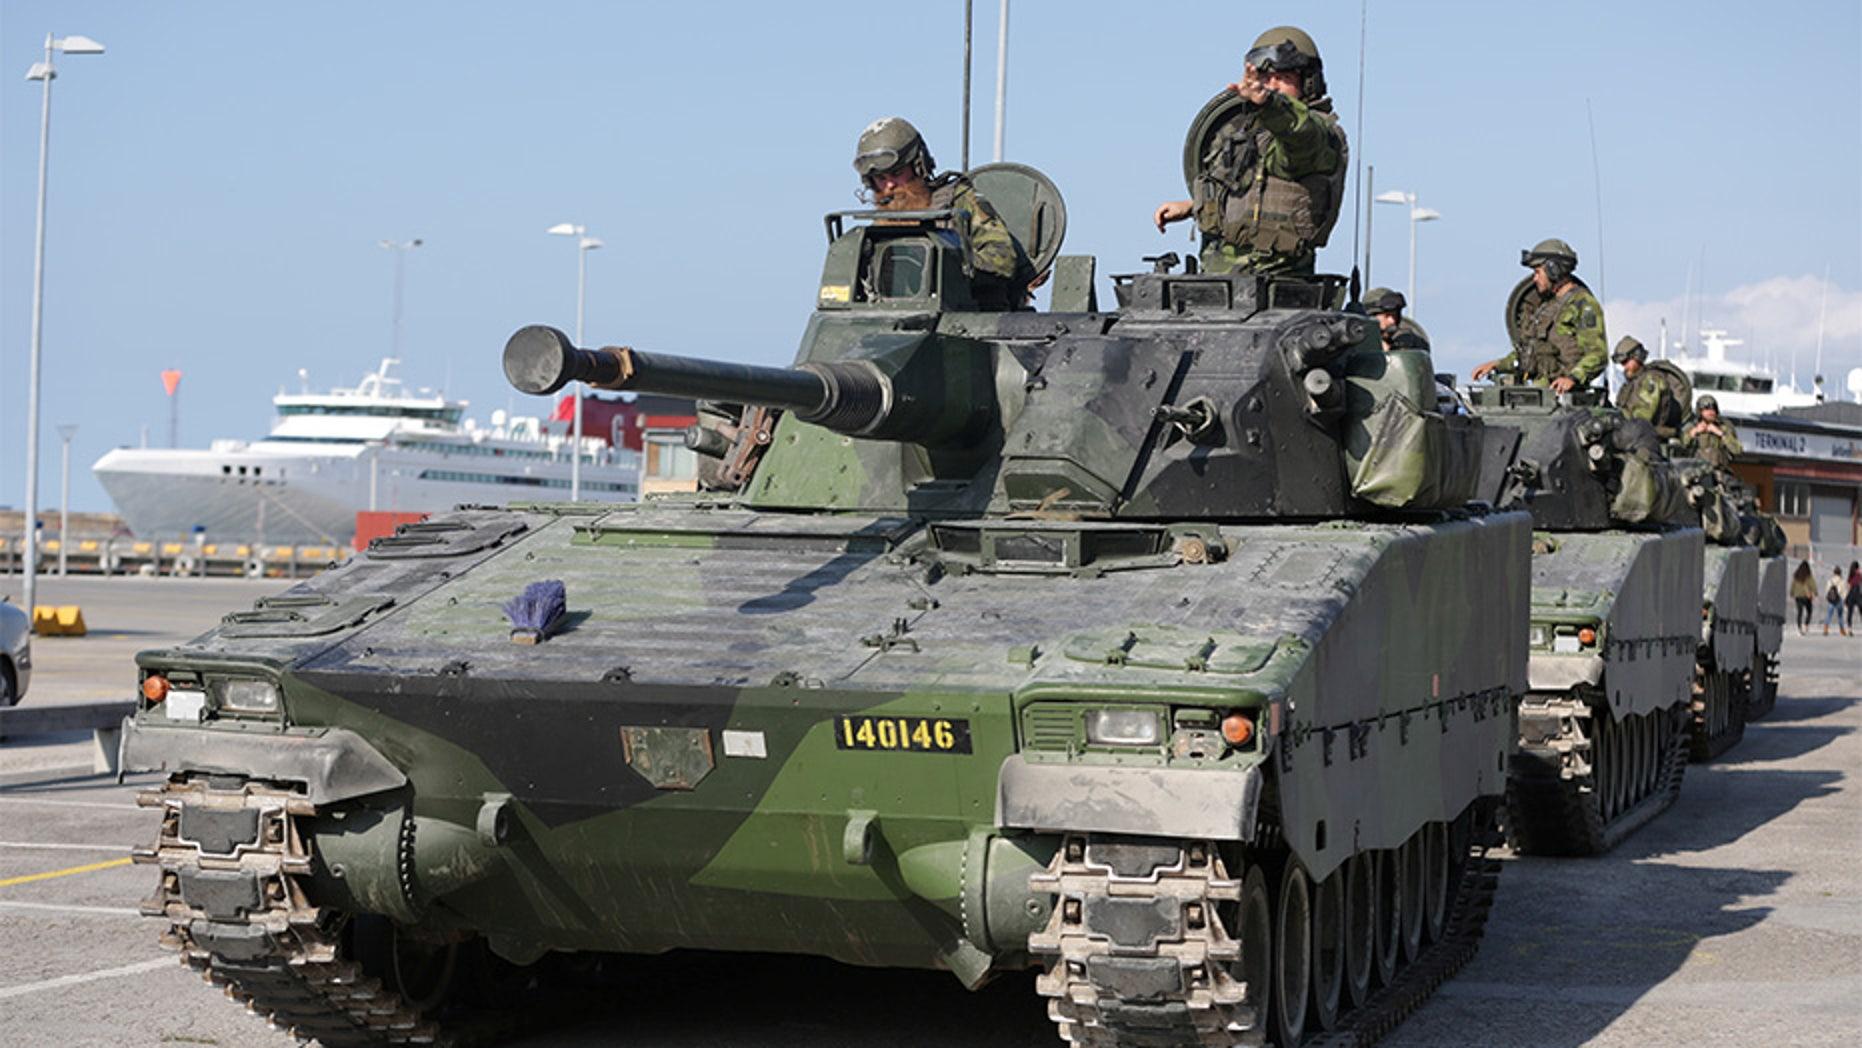 Sept. 14, 2016: A Swedish Skaraborg Armoured Regiment team trains on the island of Gotland in the Baltic Sea.